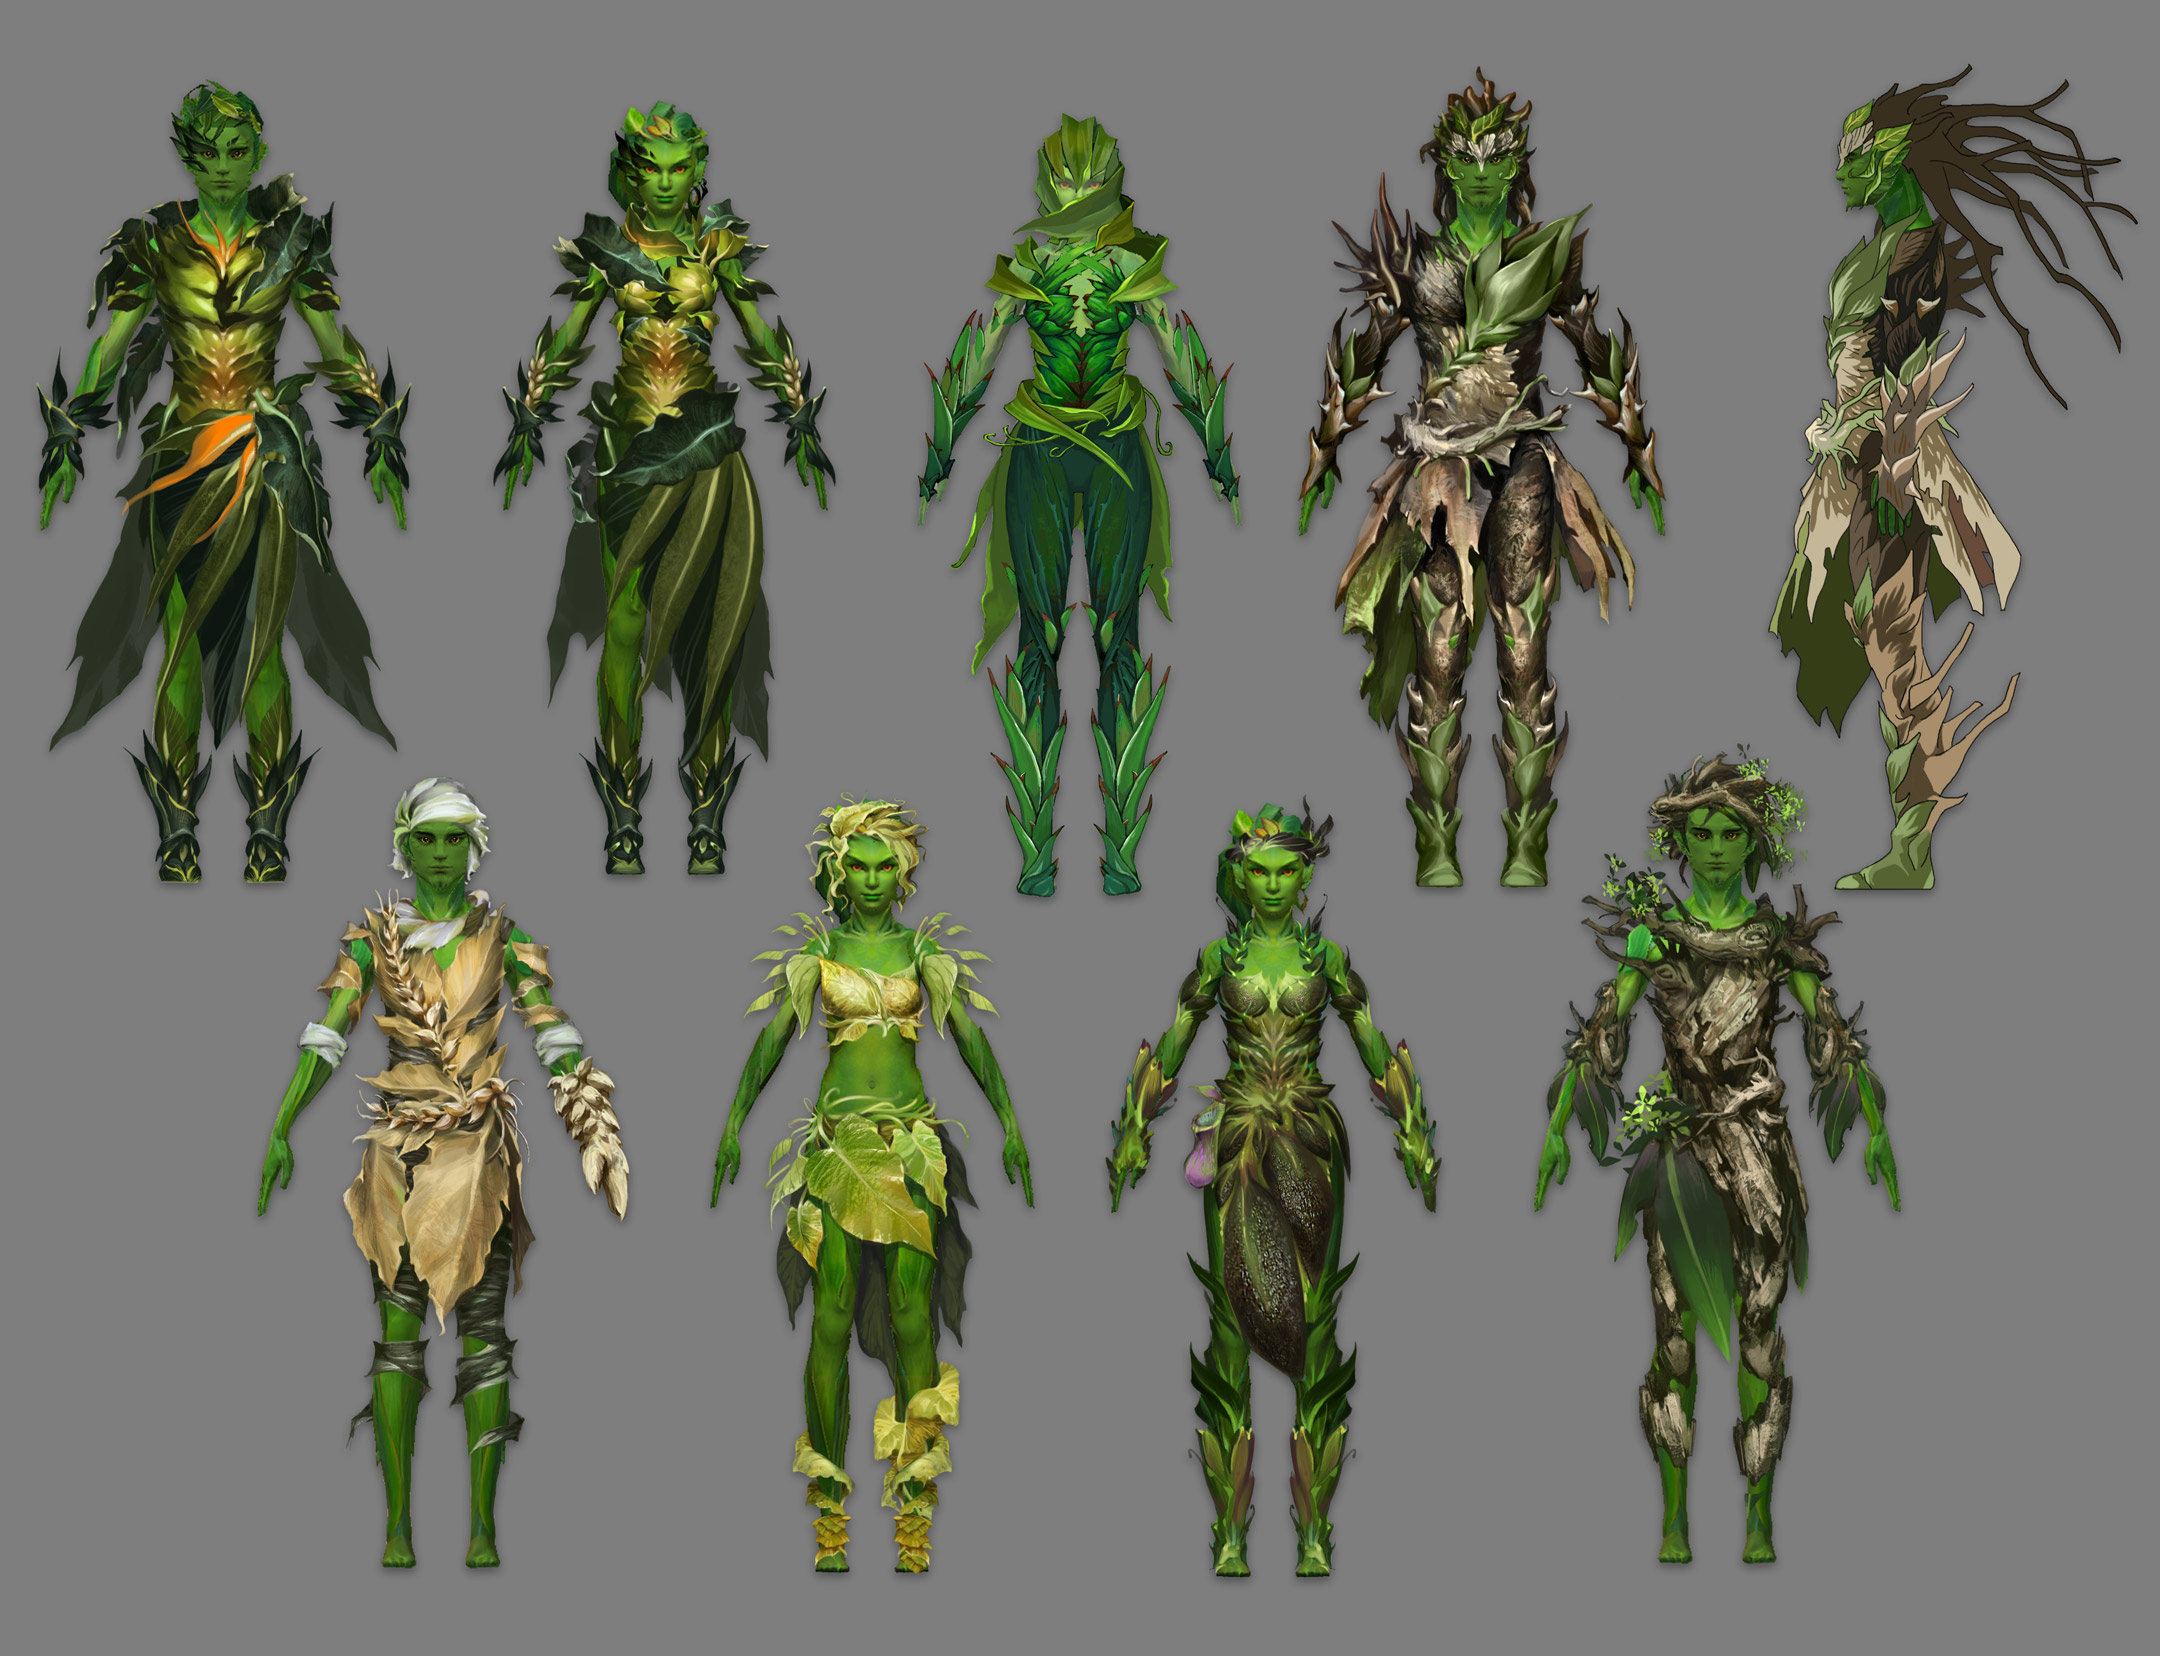 Guild Wars 2 sylvari redesign takes more plant-like qualities